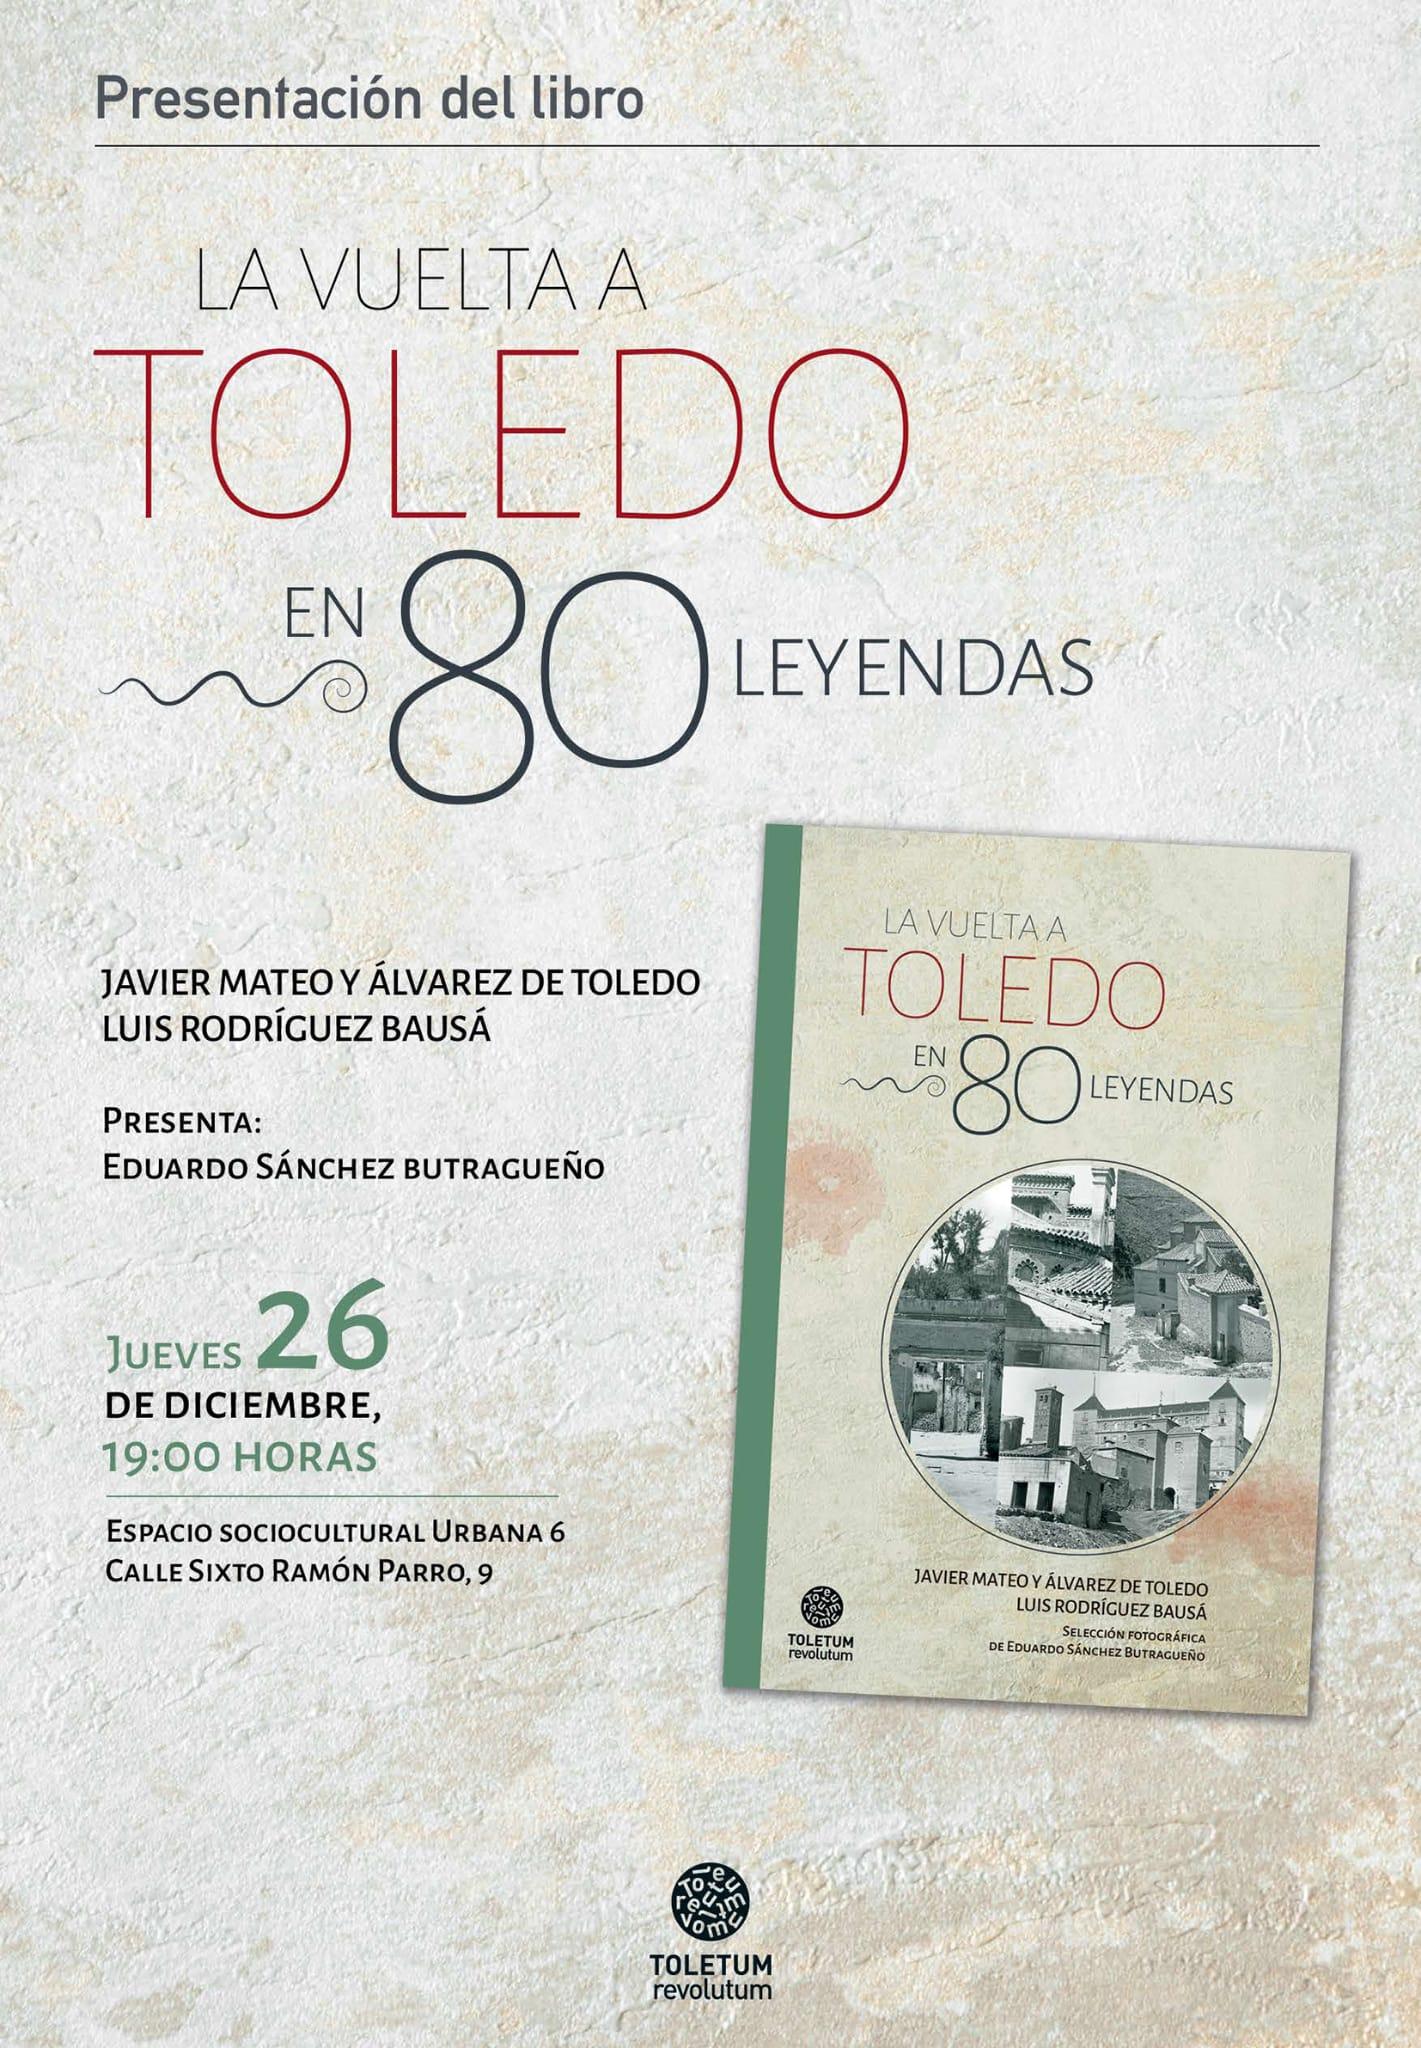 La vuelta a Toledo en 80 leyendas 2019